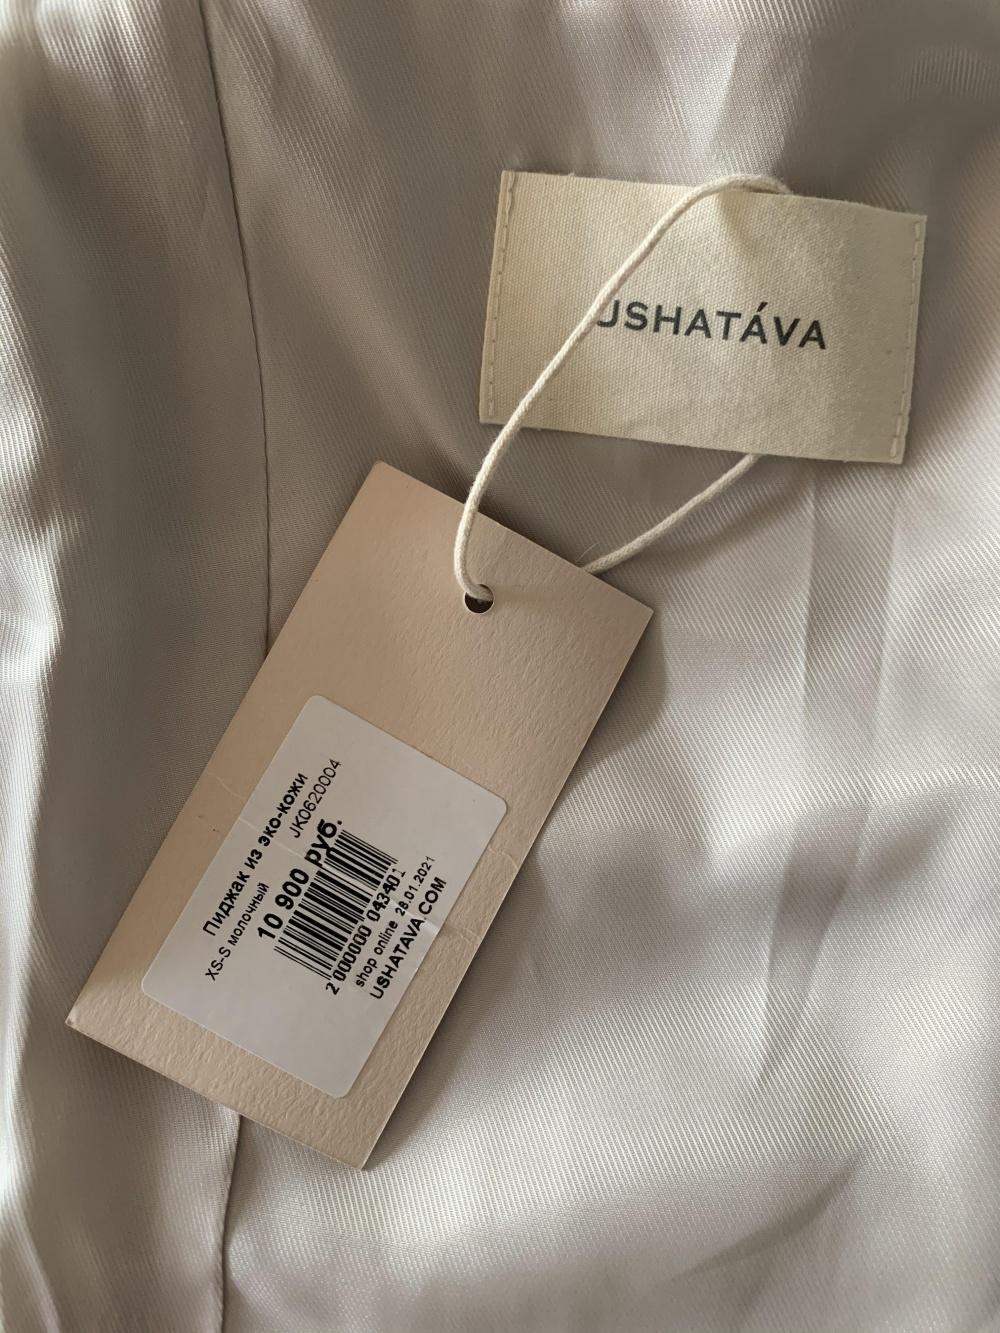 Пиджак Ushatava, OS